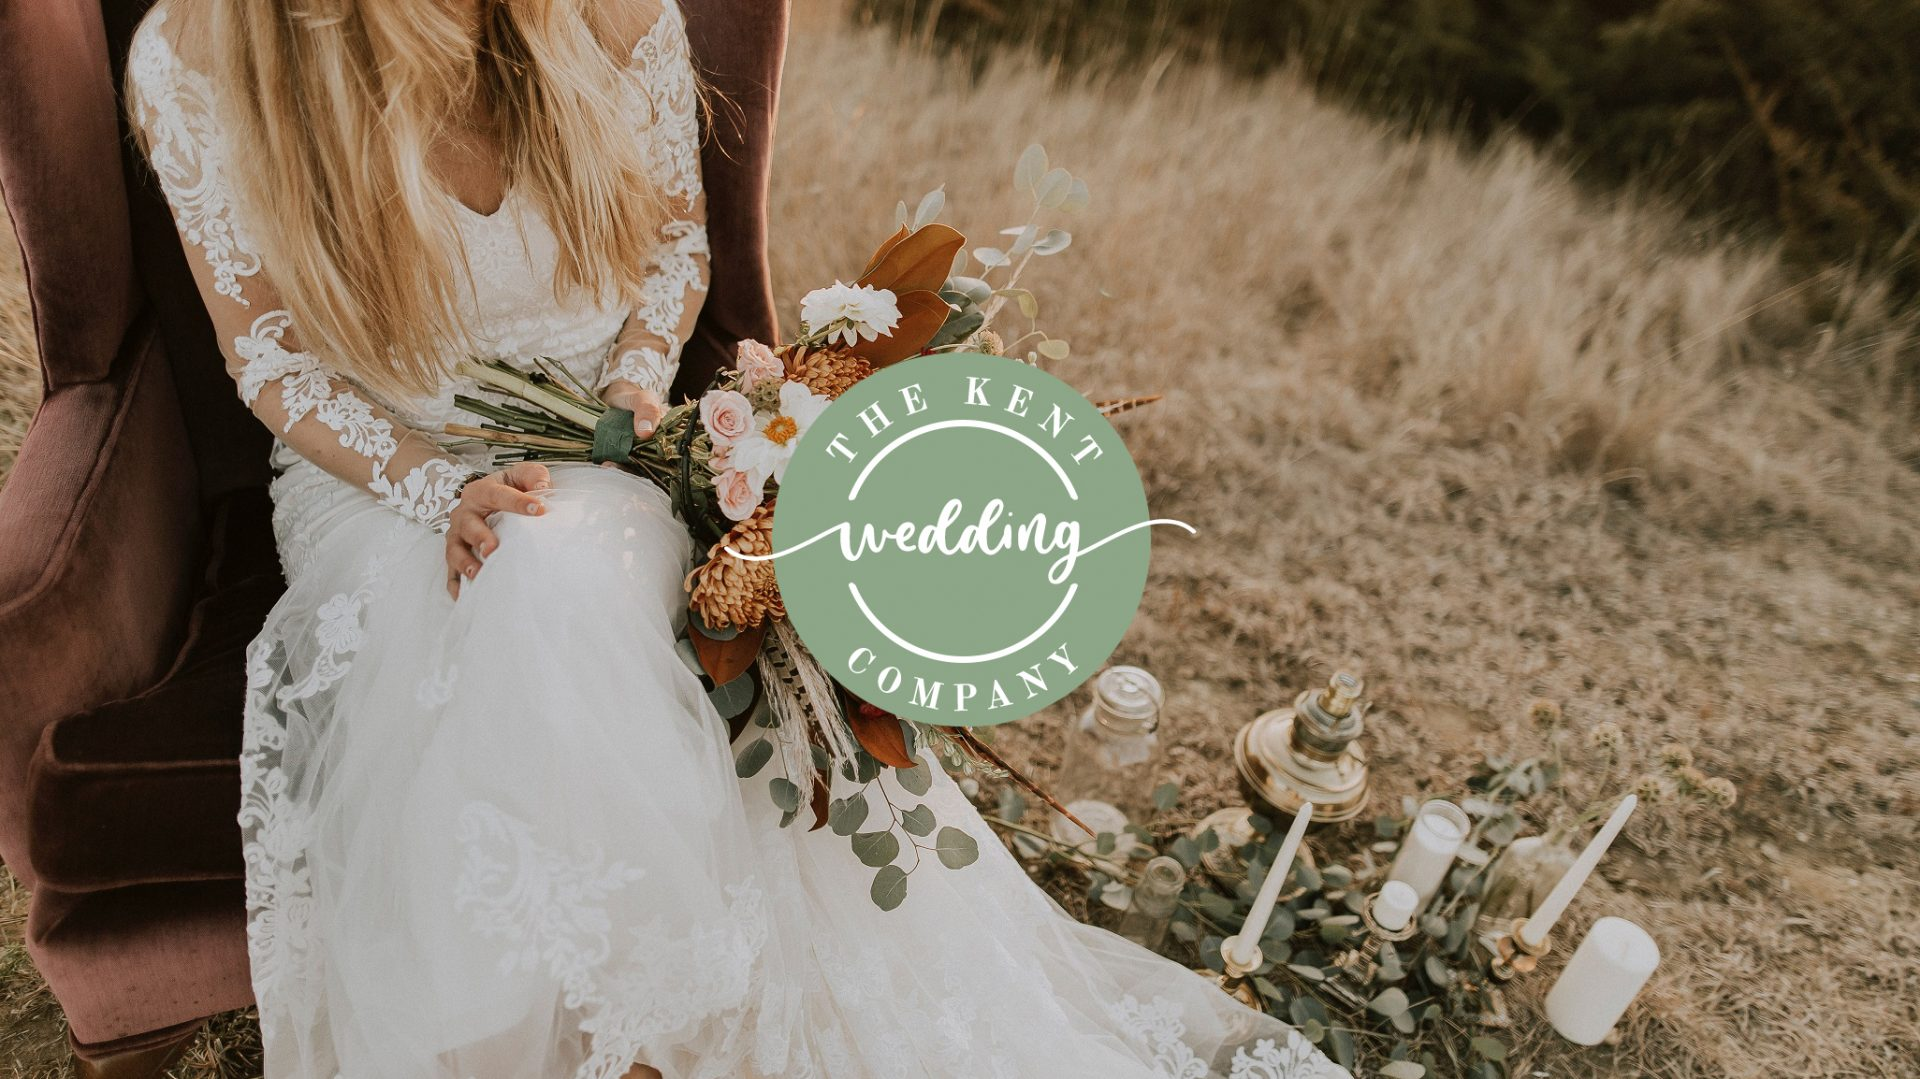 The Kent Wedding Company